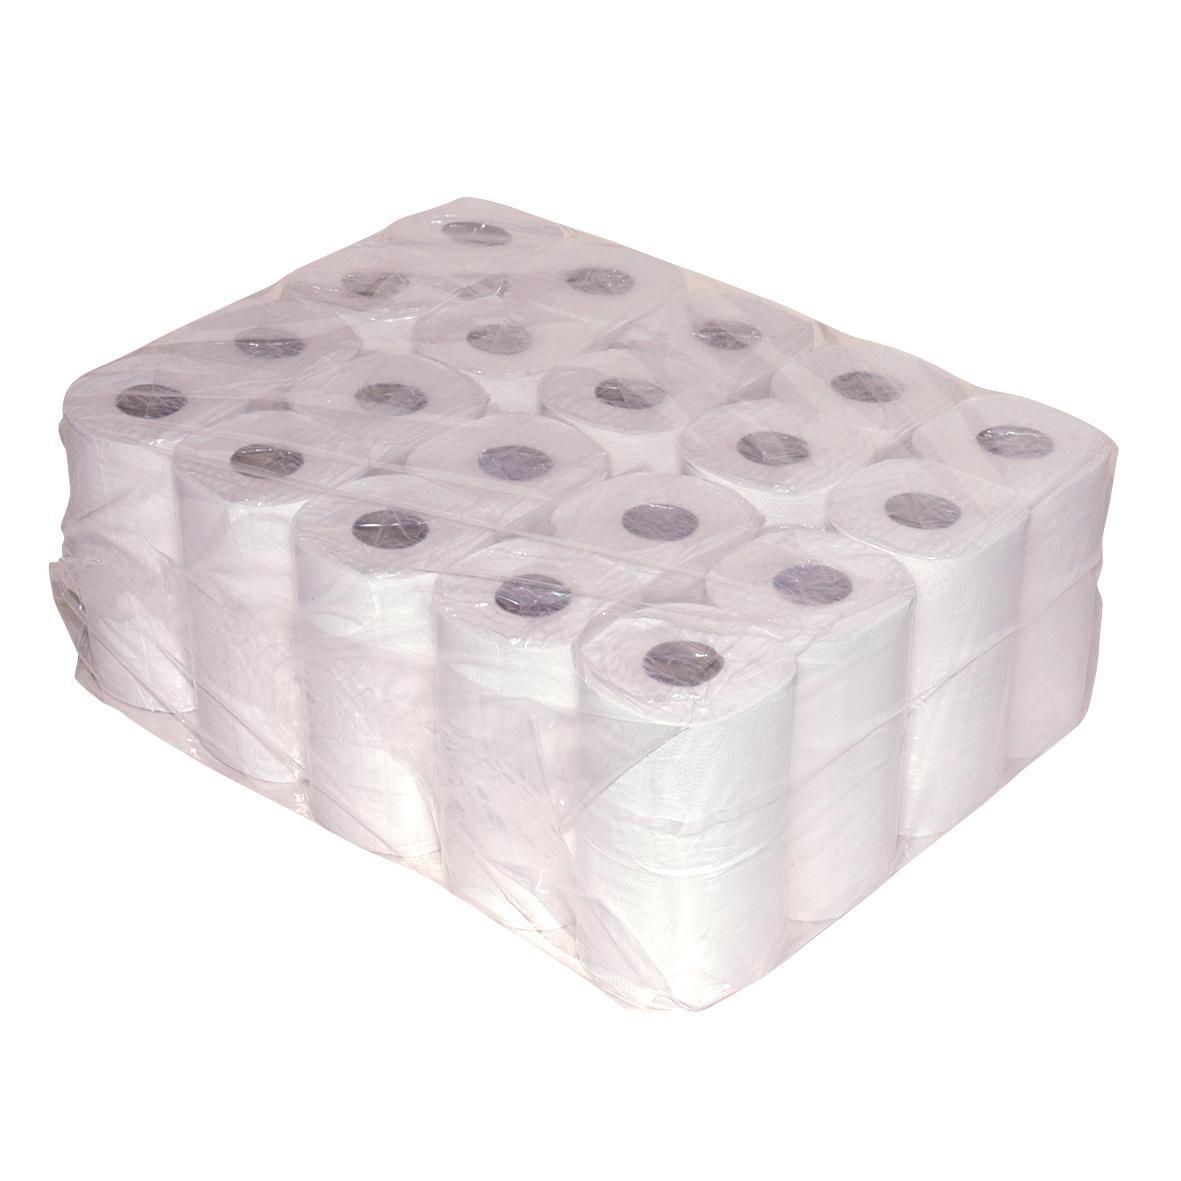 Toiletpapier 2laags 12x4rol Tissue 200vel